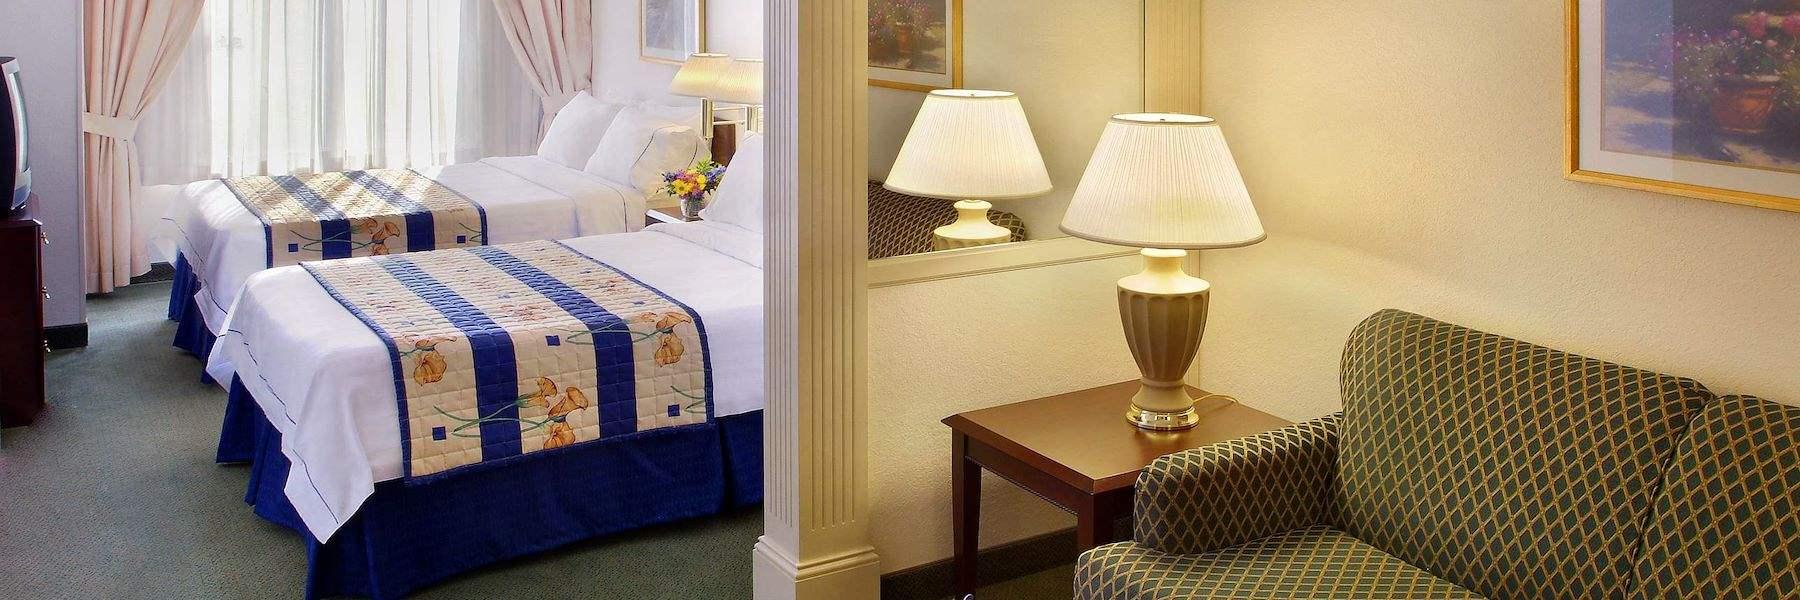 SpringHill Suites Boston Andover